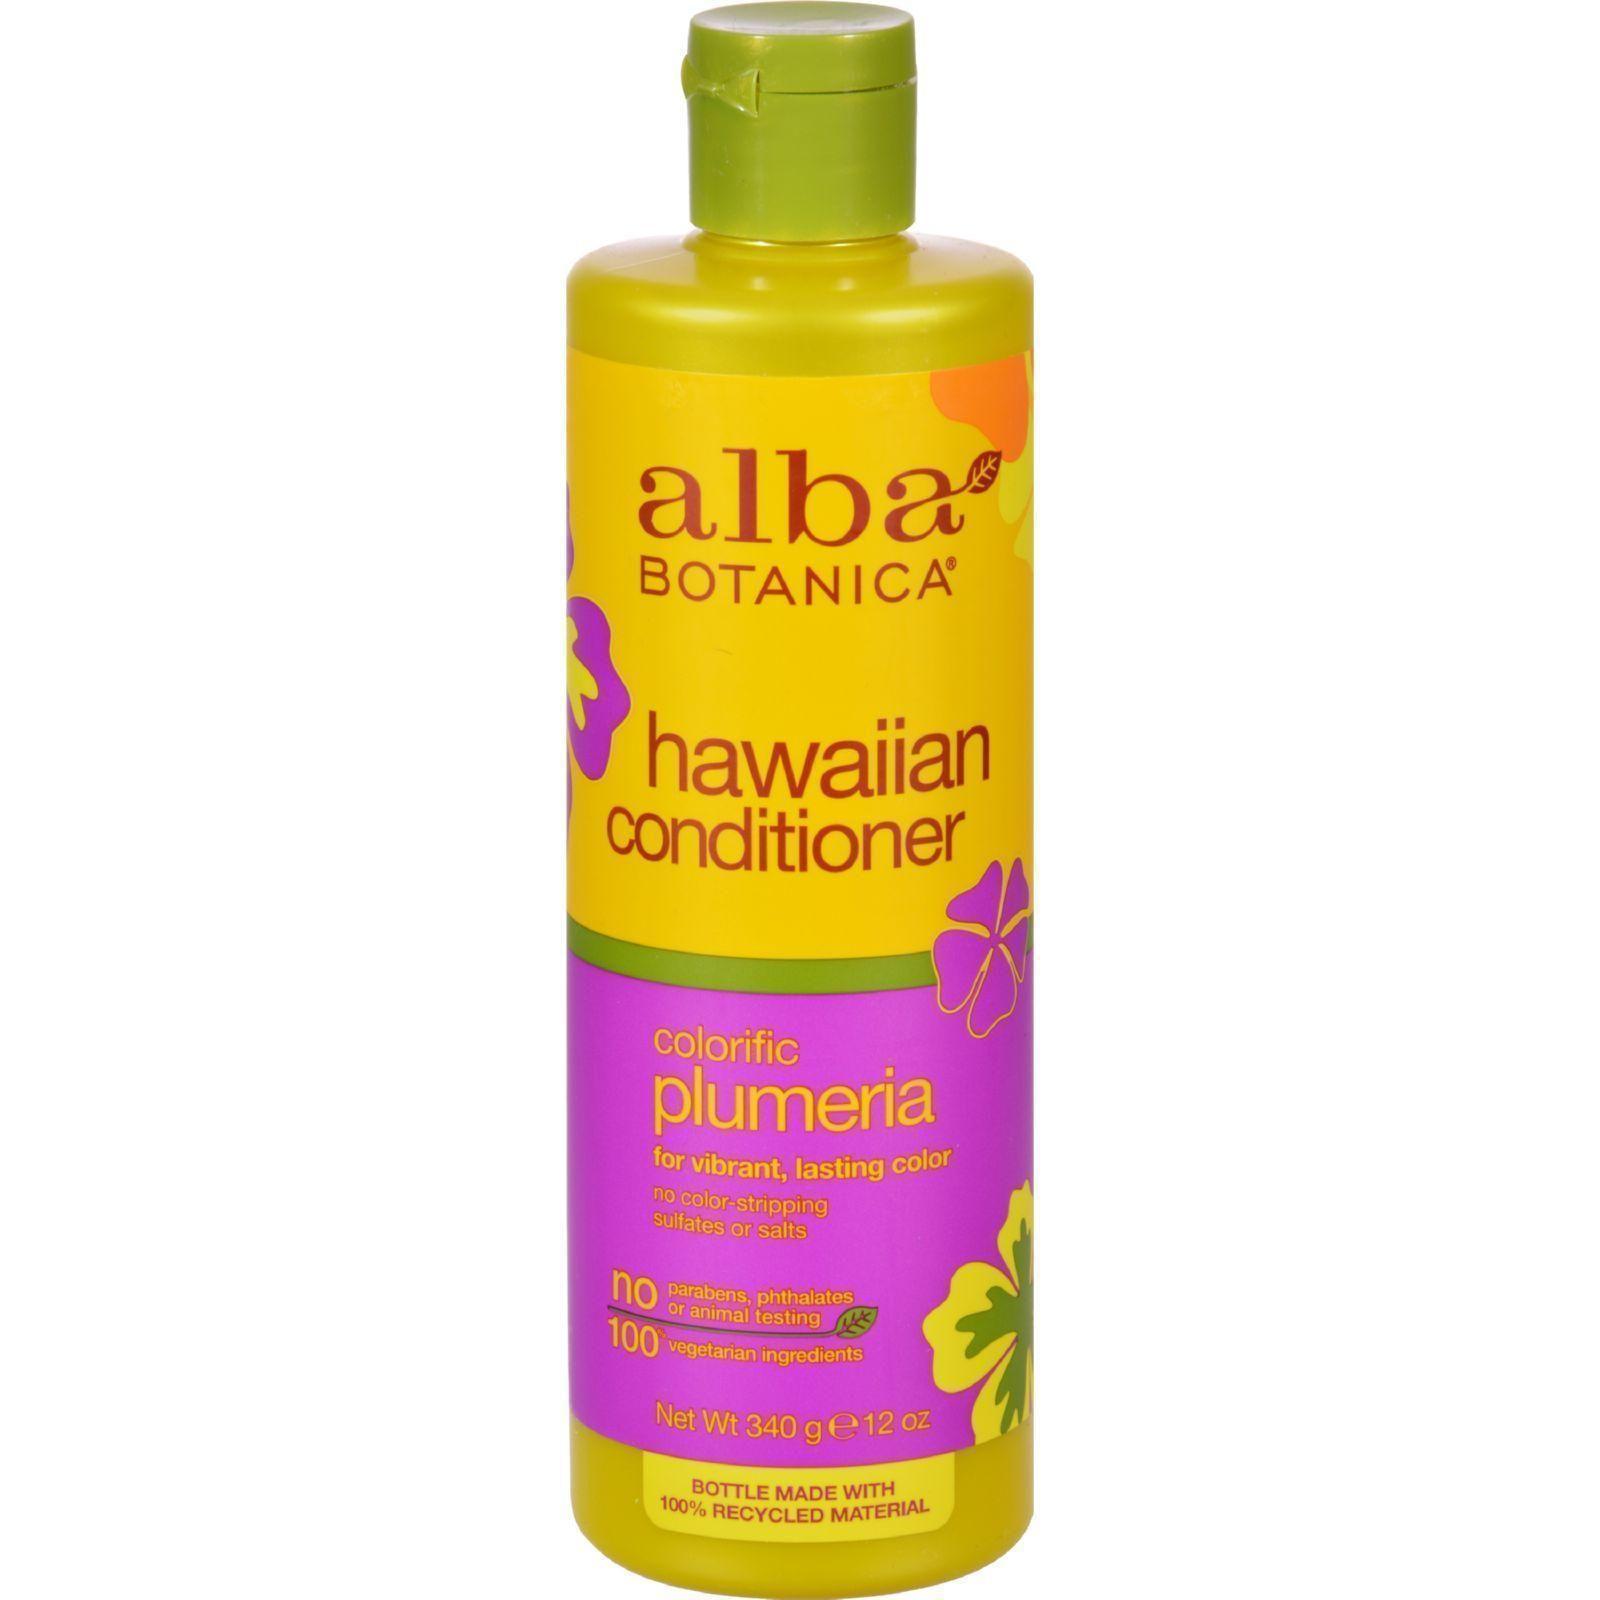 Colorific shampoo by Alba Botanica   Read Reviews & Shop ...  Alba Volumizing Shampoo